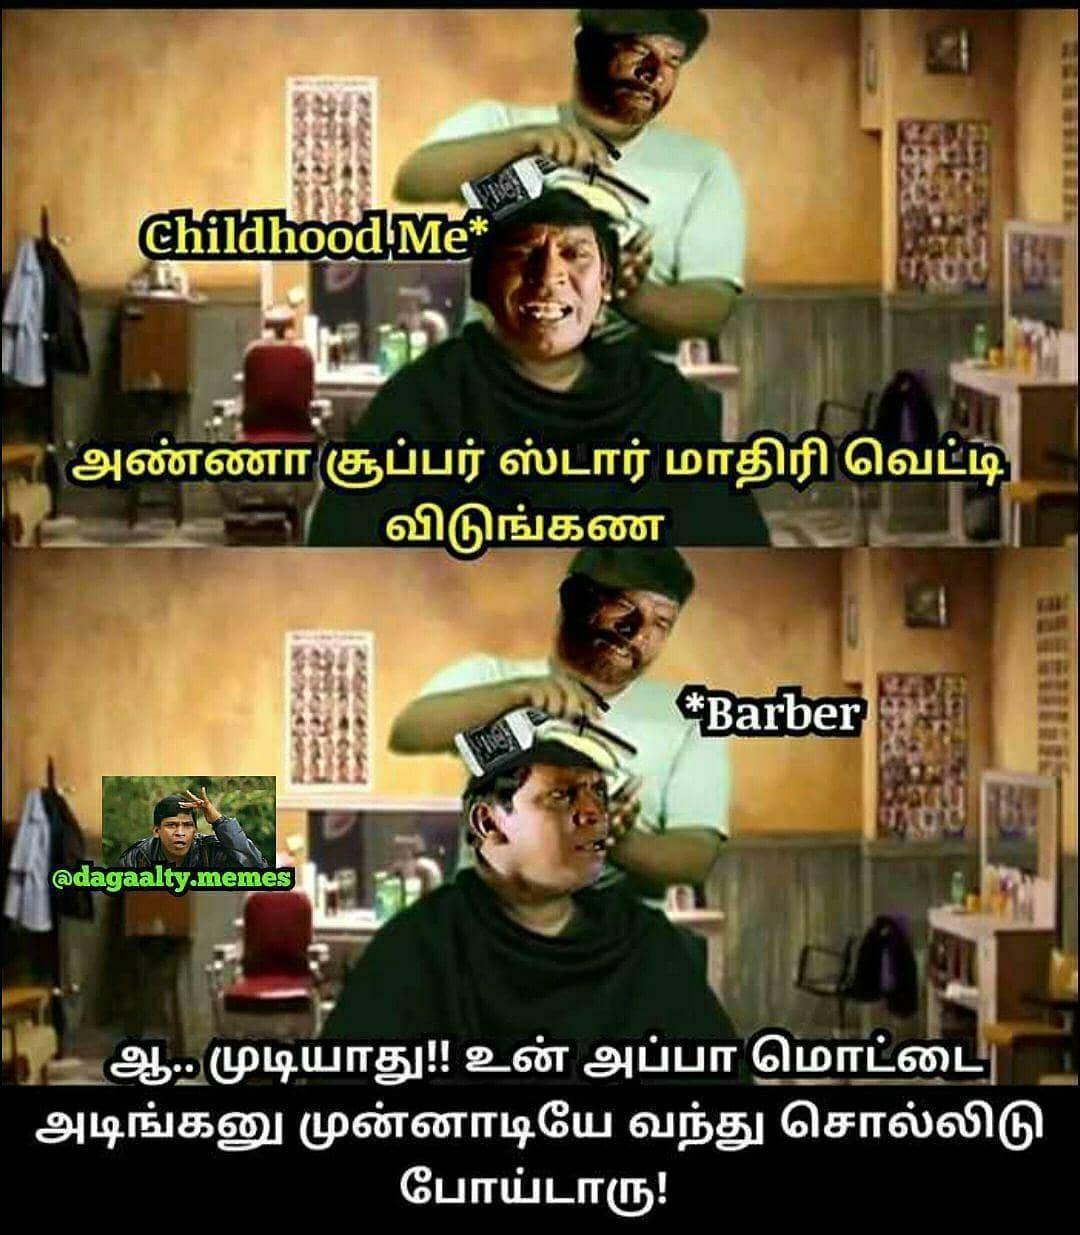 Pin By Sameera On Funny Jok In 2021 Funny Jok Funny Cartoon Memes Insta Fashion